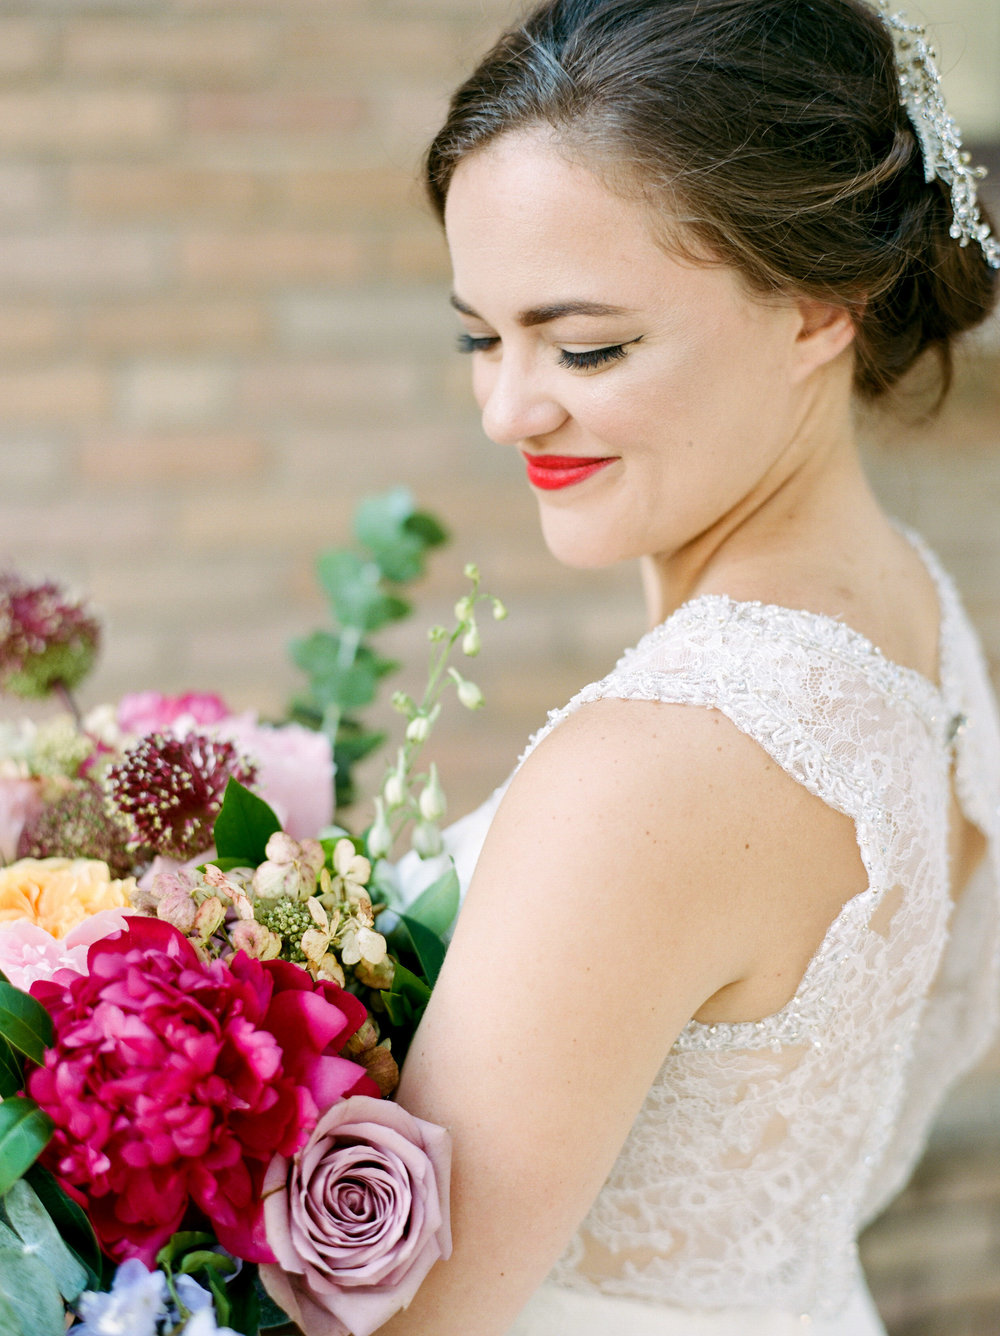 The-Knot-Texas-Fine-Art-Wedding-Film-Destination-Photographer-Houston-Austin-Dallas-New-Orleans-Julia-Ideson-Library-Event-Dana-Josh-Fernandez-Photograph-Top-Best-24.jpg